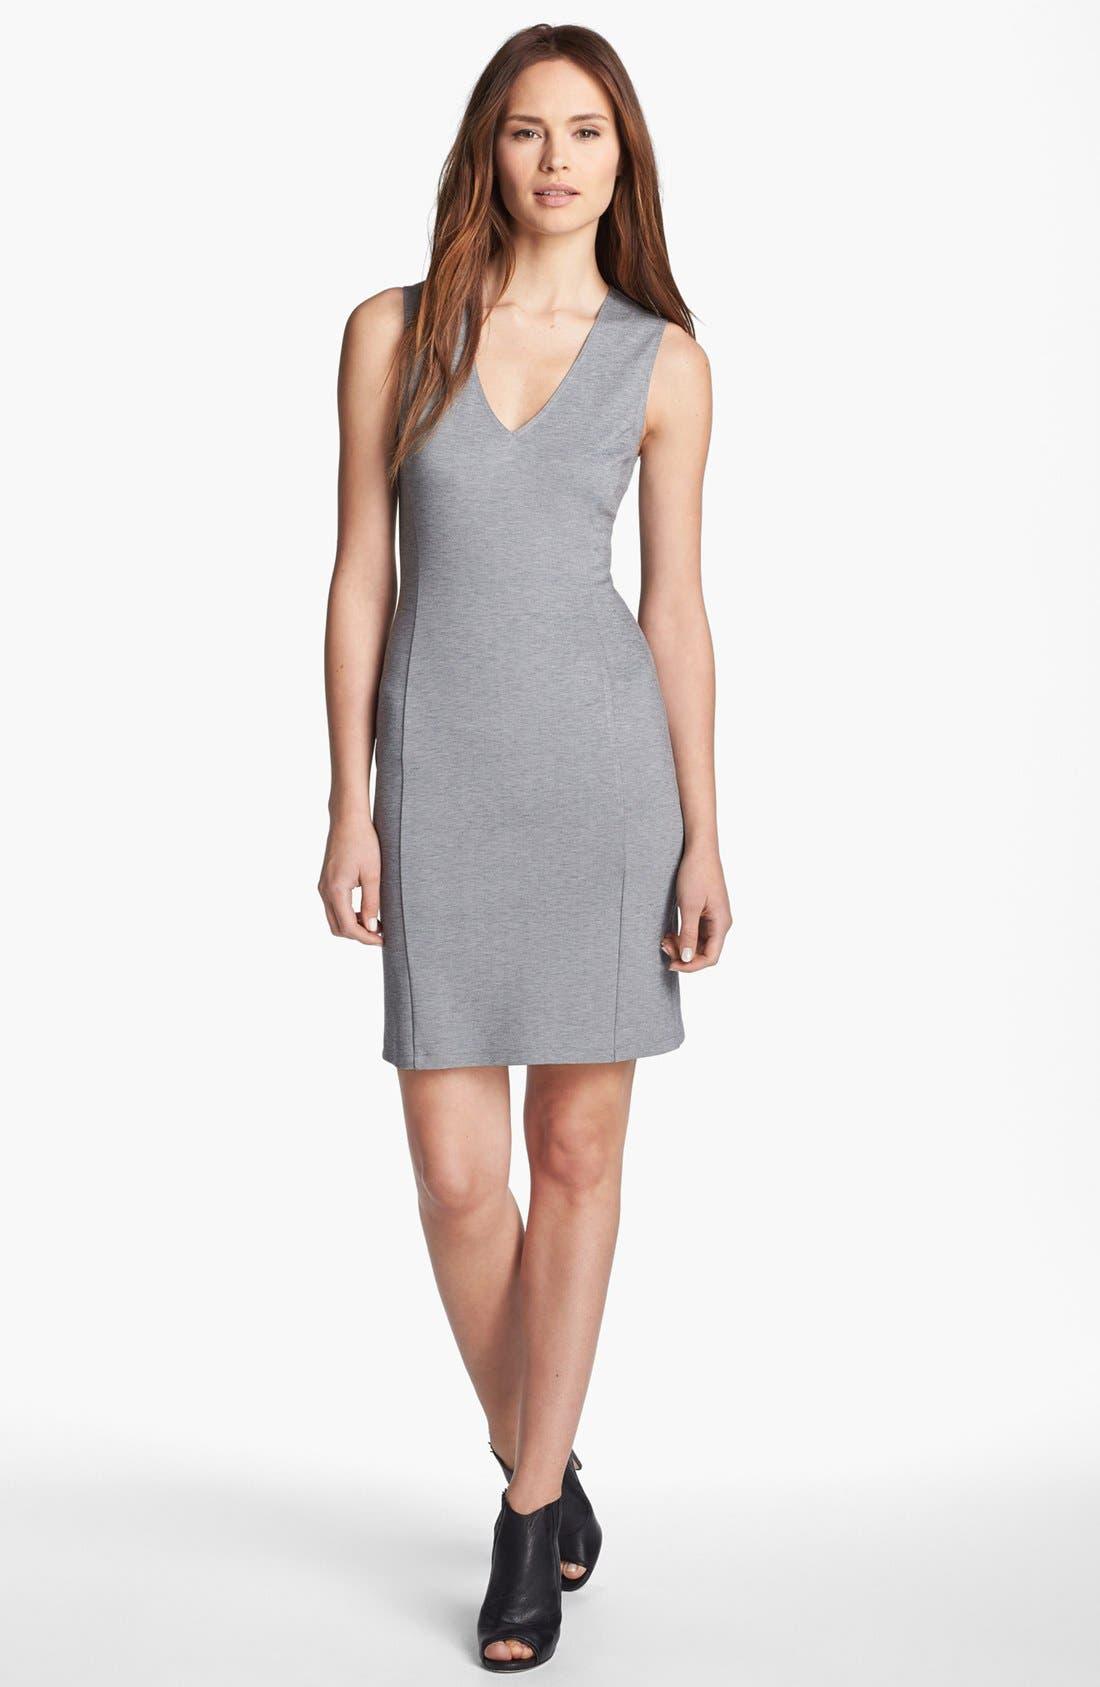 Main Image - Theory 'Adoxa' Stretch Sheath Dress